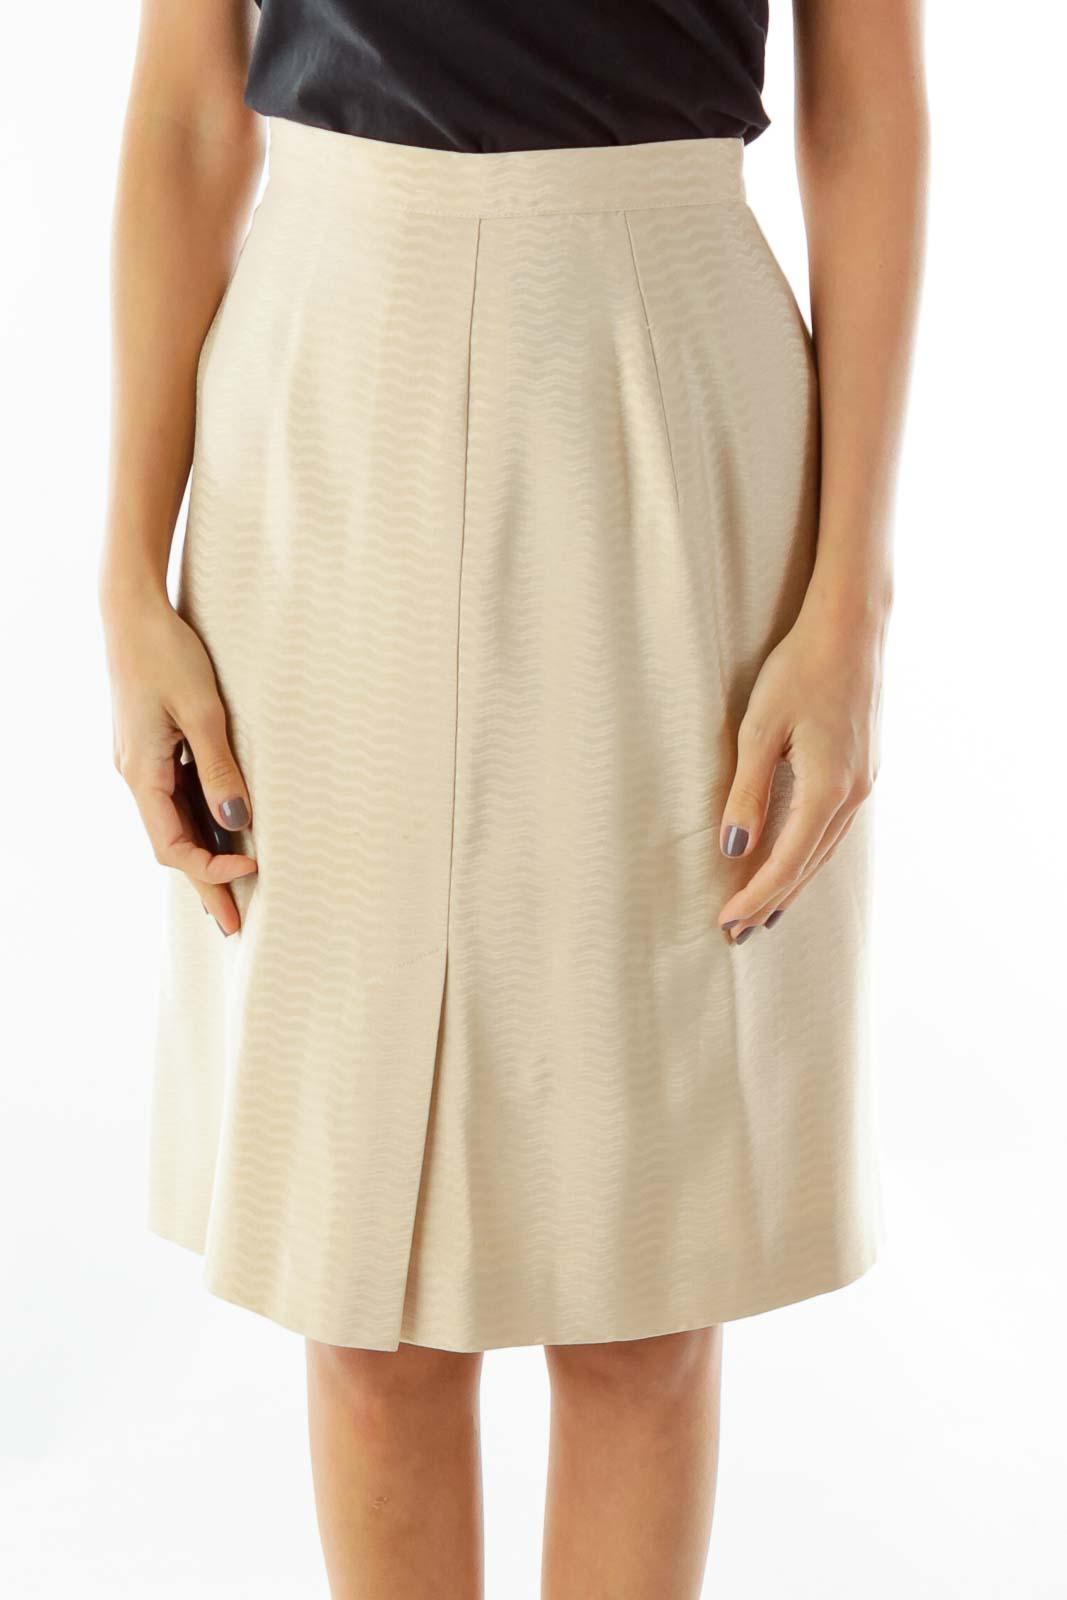 Beige Designer Pencil Skirt